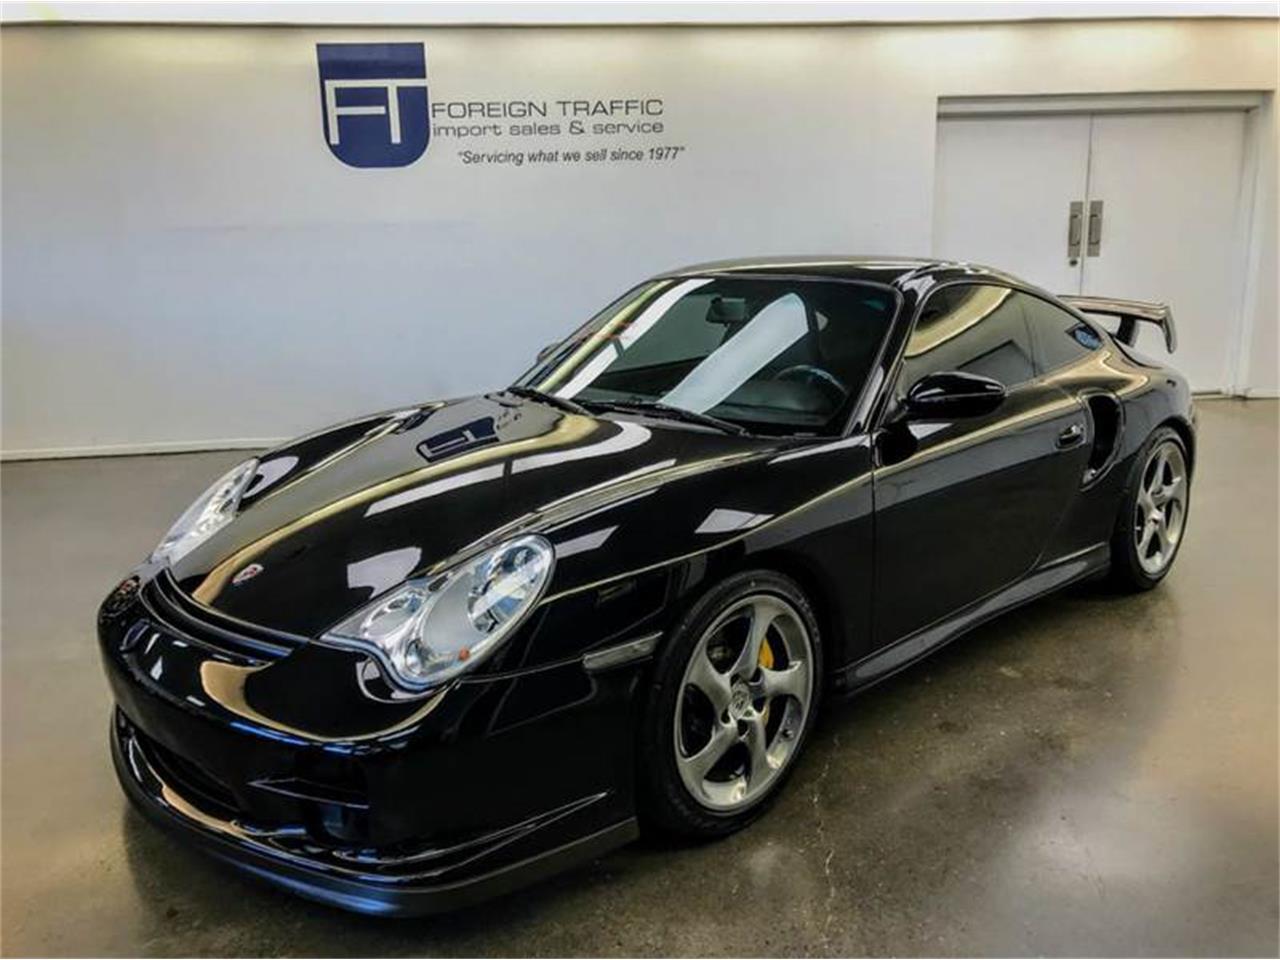 Large Picture of 2002 Porsche 911 located in Allison Park Pennsylvania - $129,950.00 - MFQA